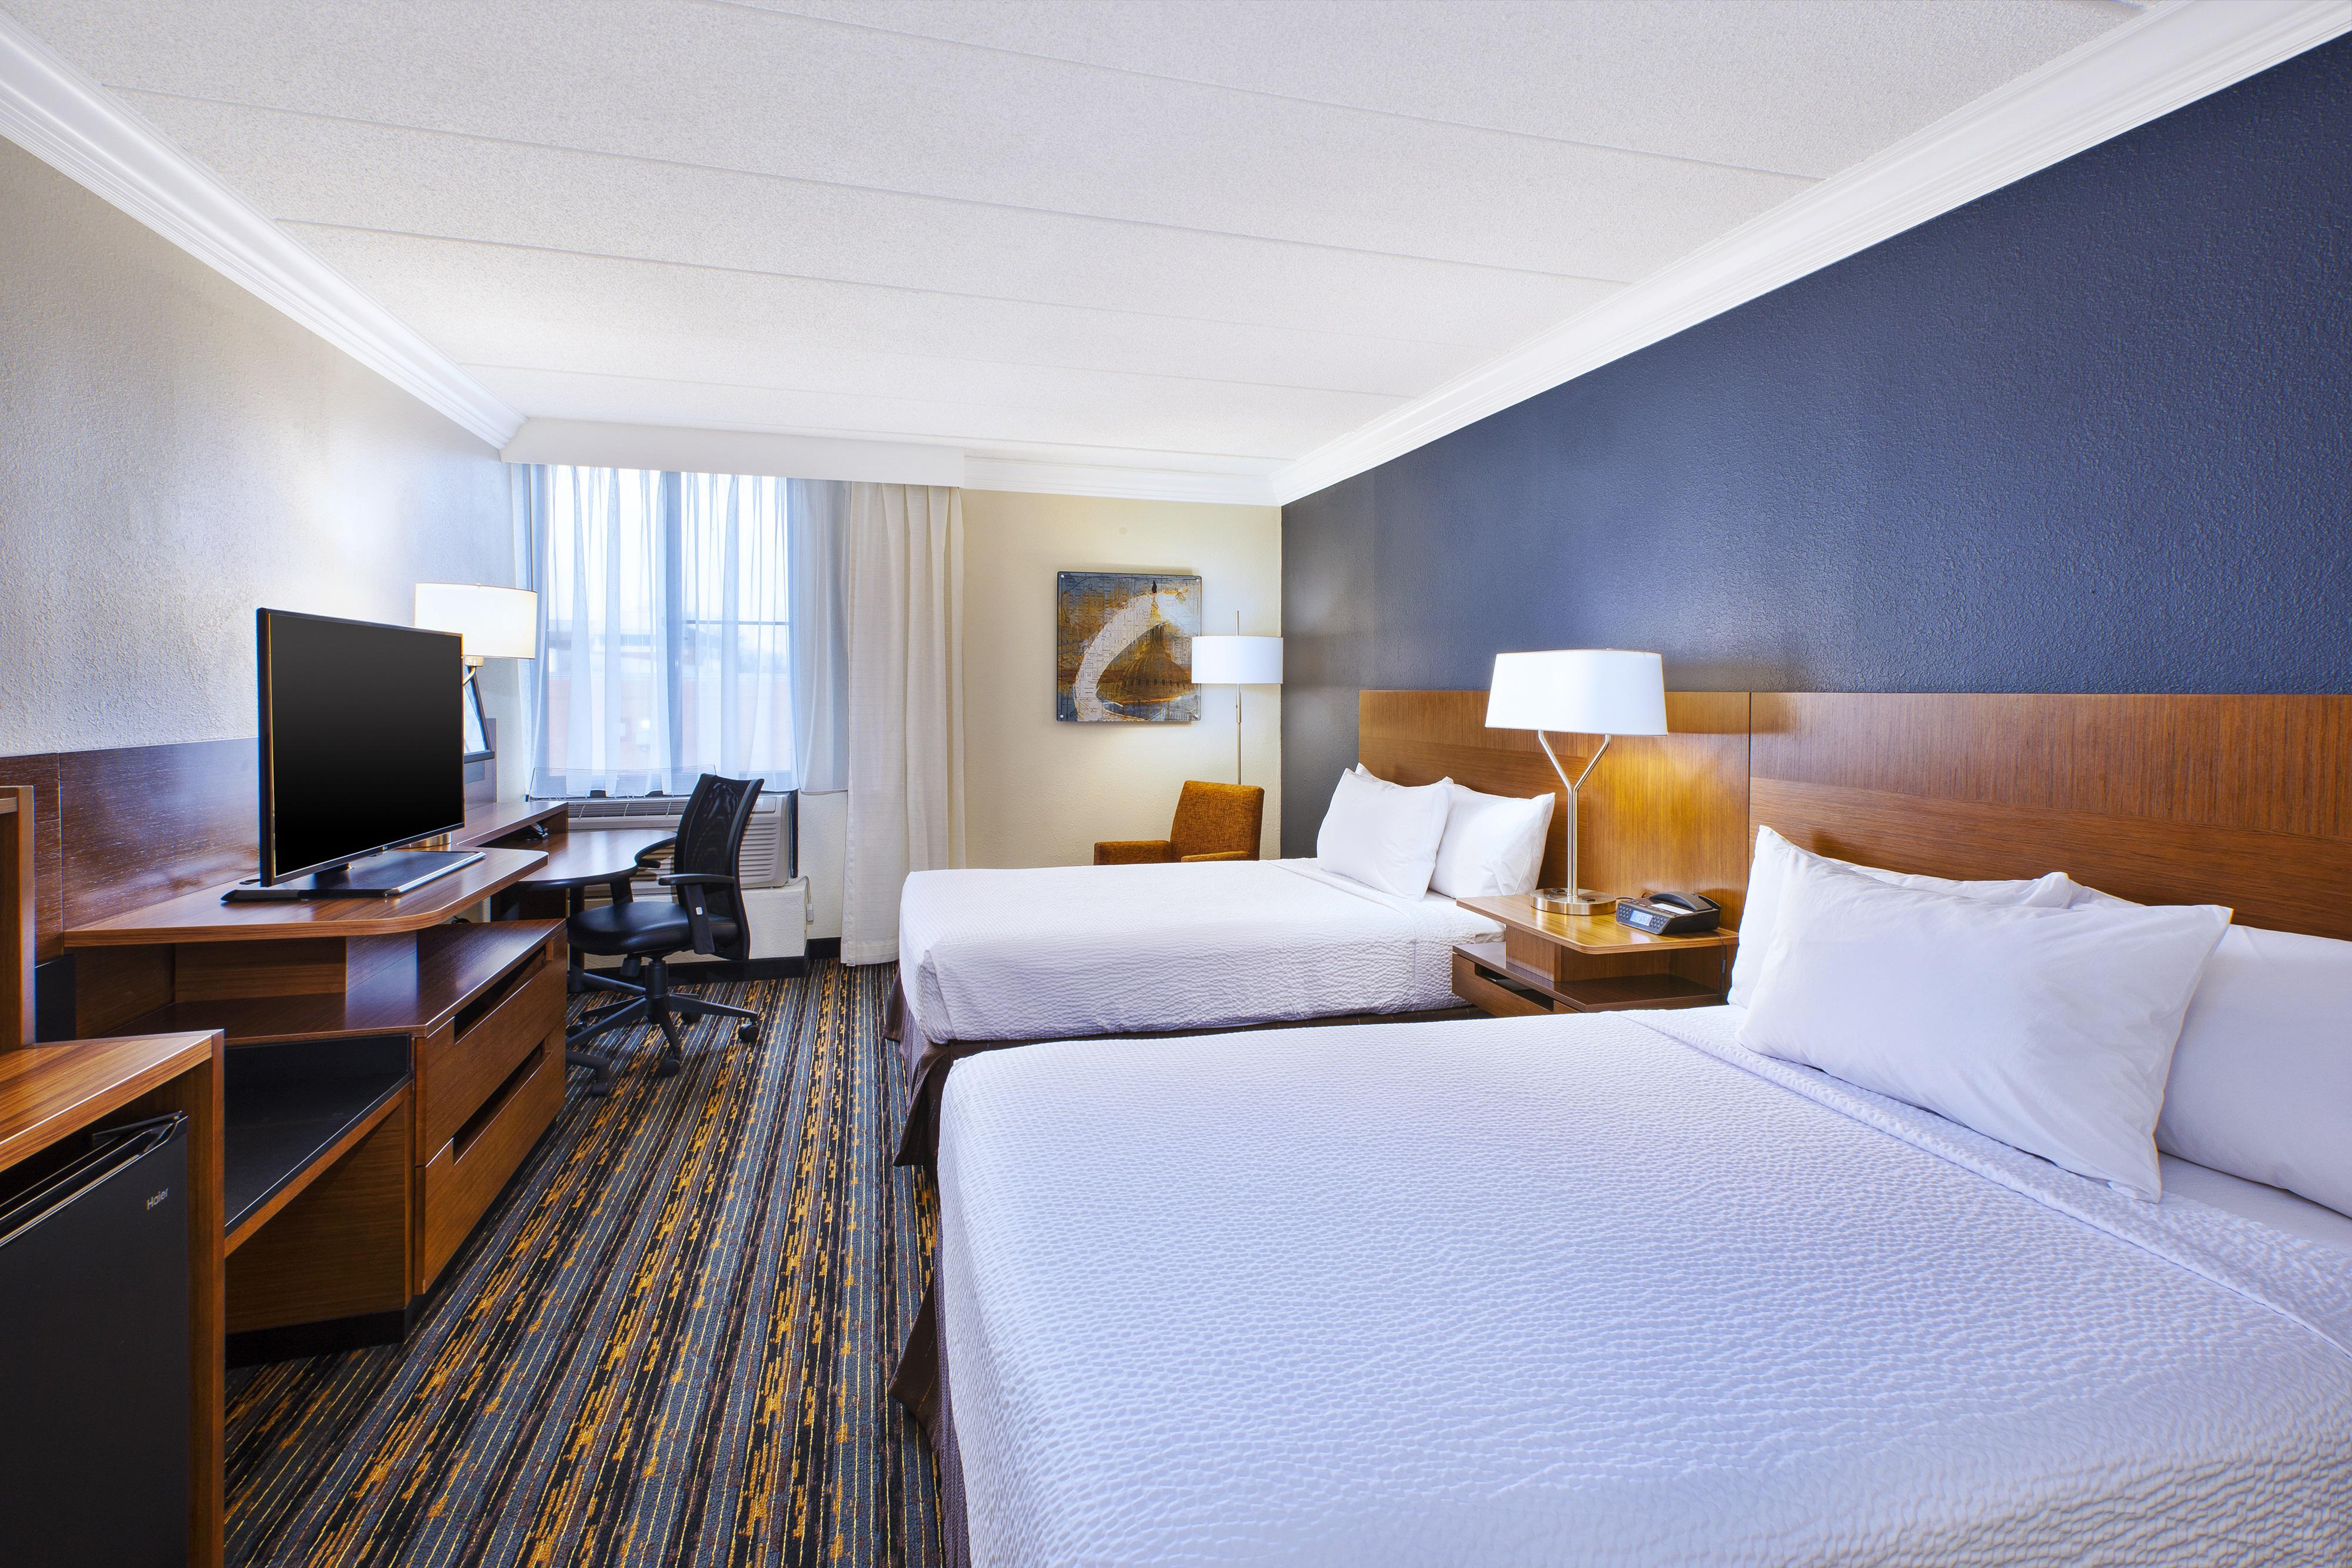 Fairfield Inn & Suites by Marriott Dulles Airport Herndon/Reston image 9